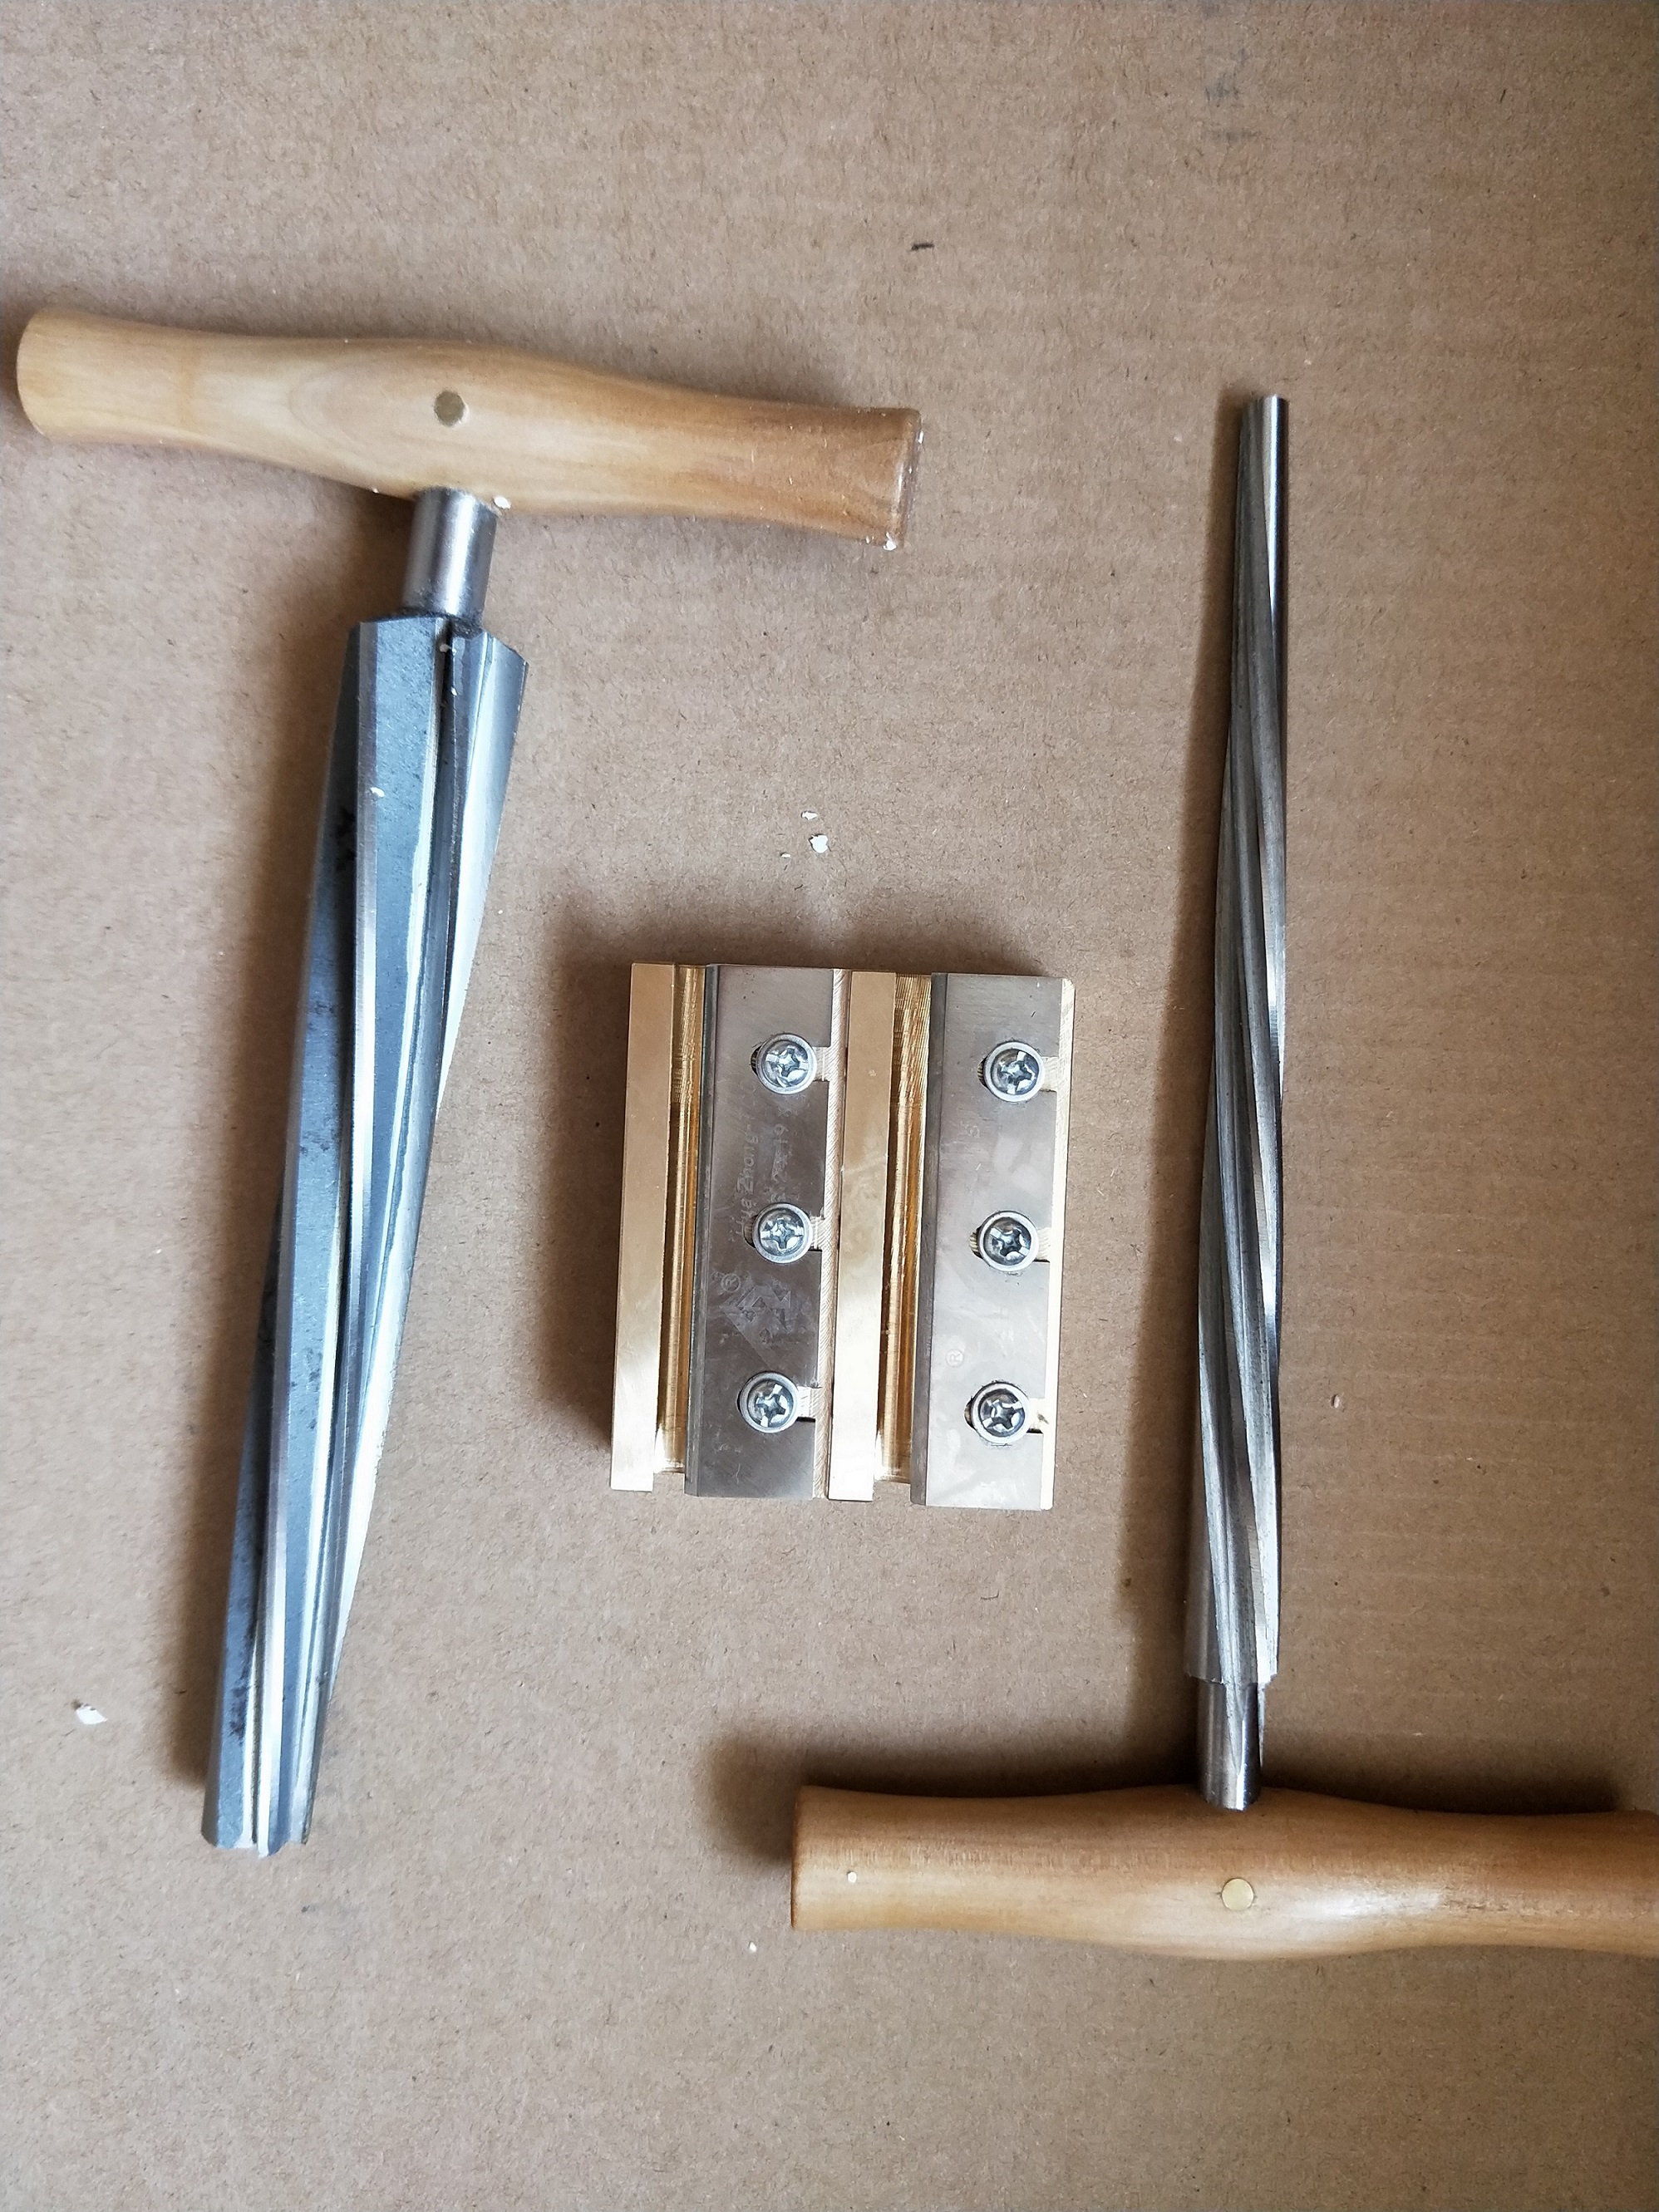 Cello Tools of Cello Pegs Reamer & Cello Peg Shaver Cello End Pin Reamer Luthier Tools 1 pc quality double bass end pin reamer luthier tool